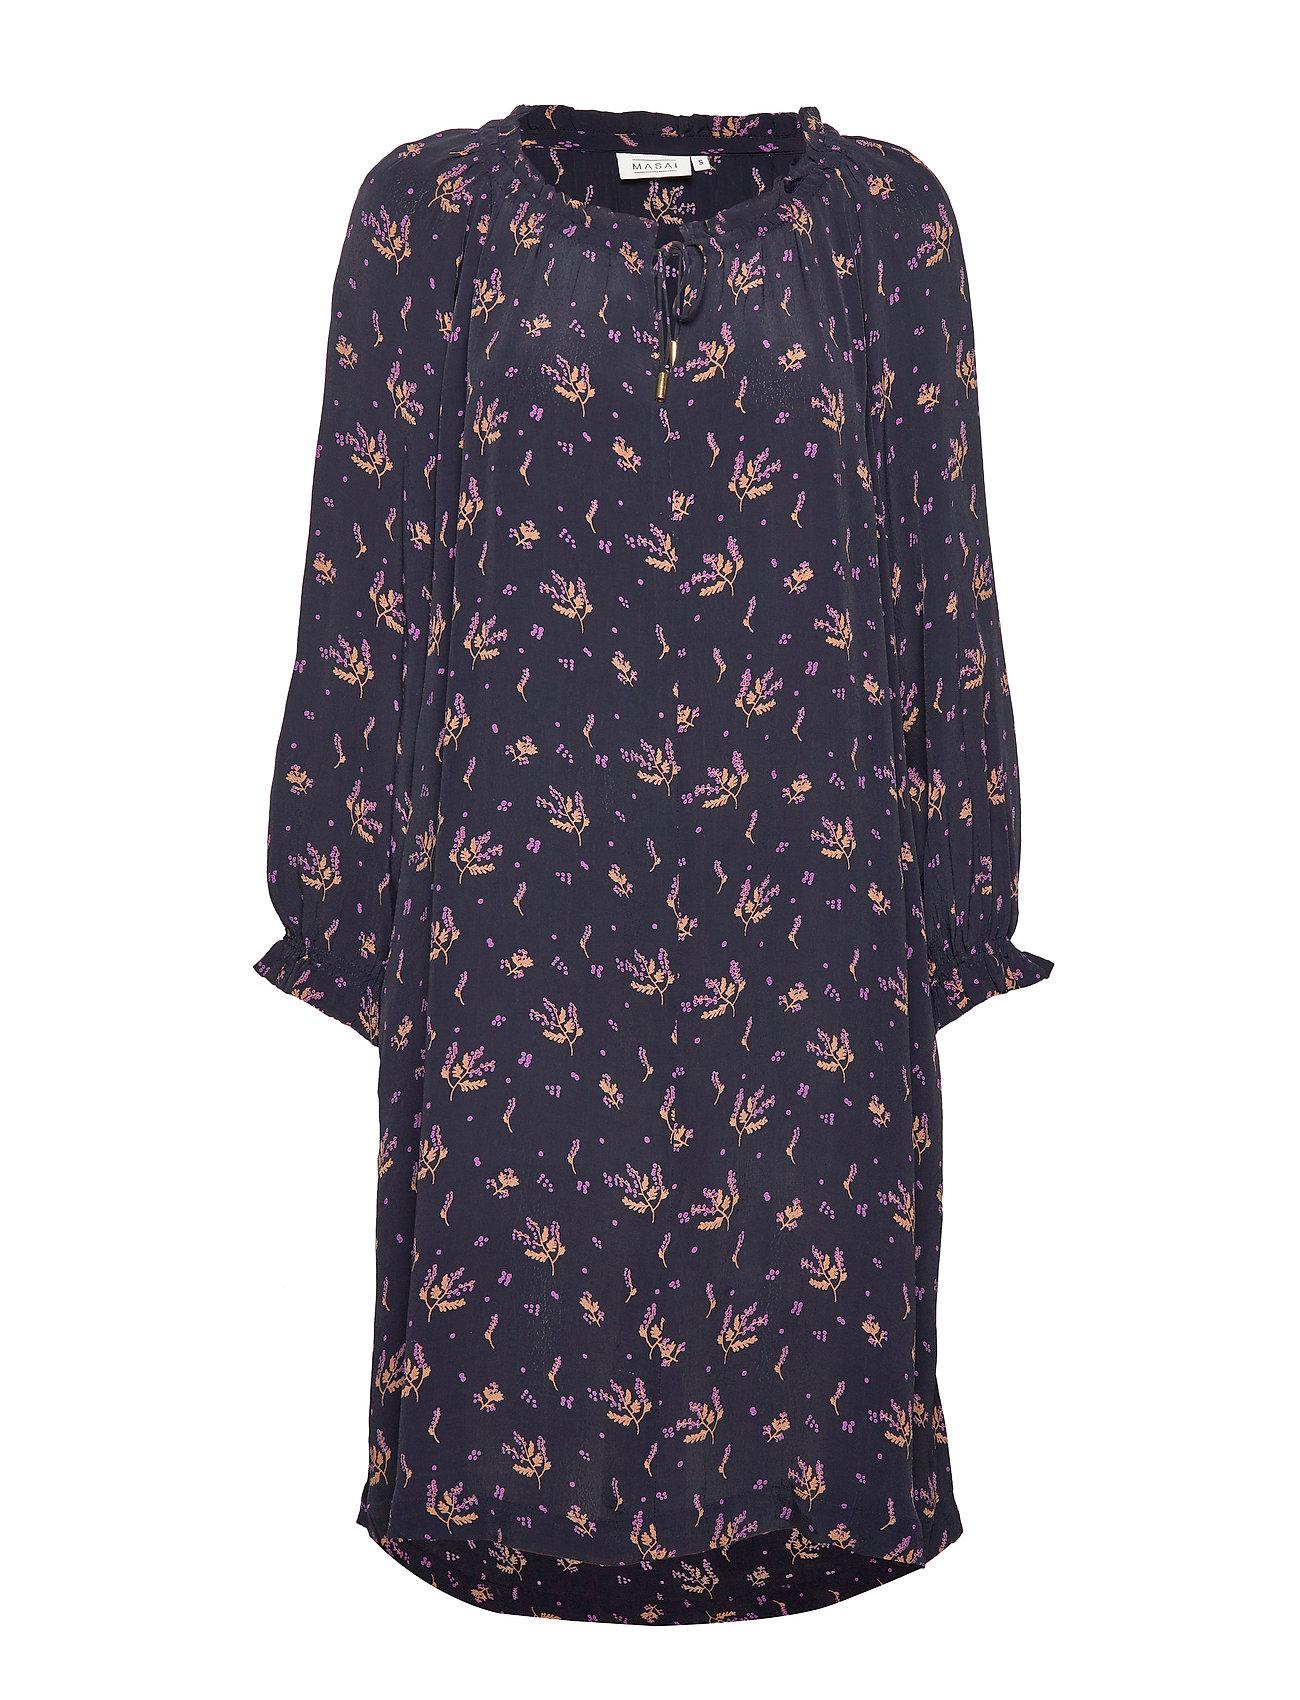 Masai Noga dress - VIOLET ORG